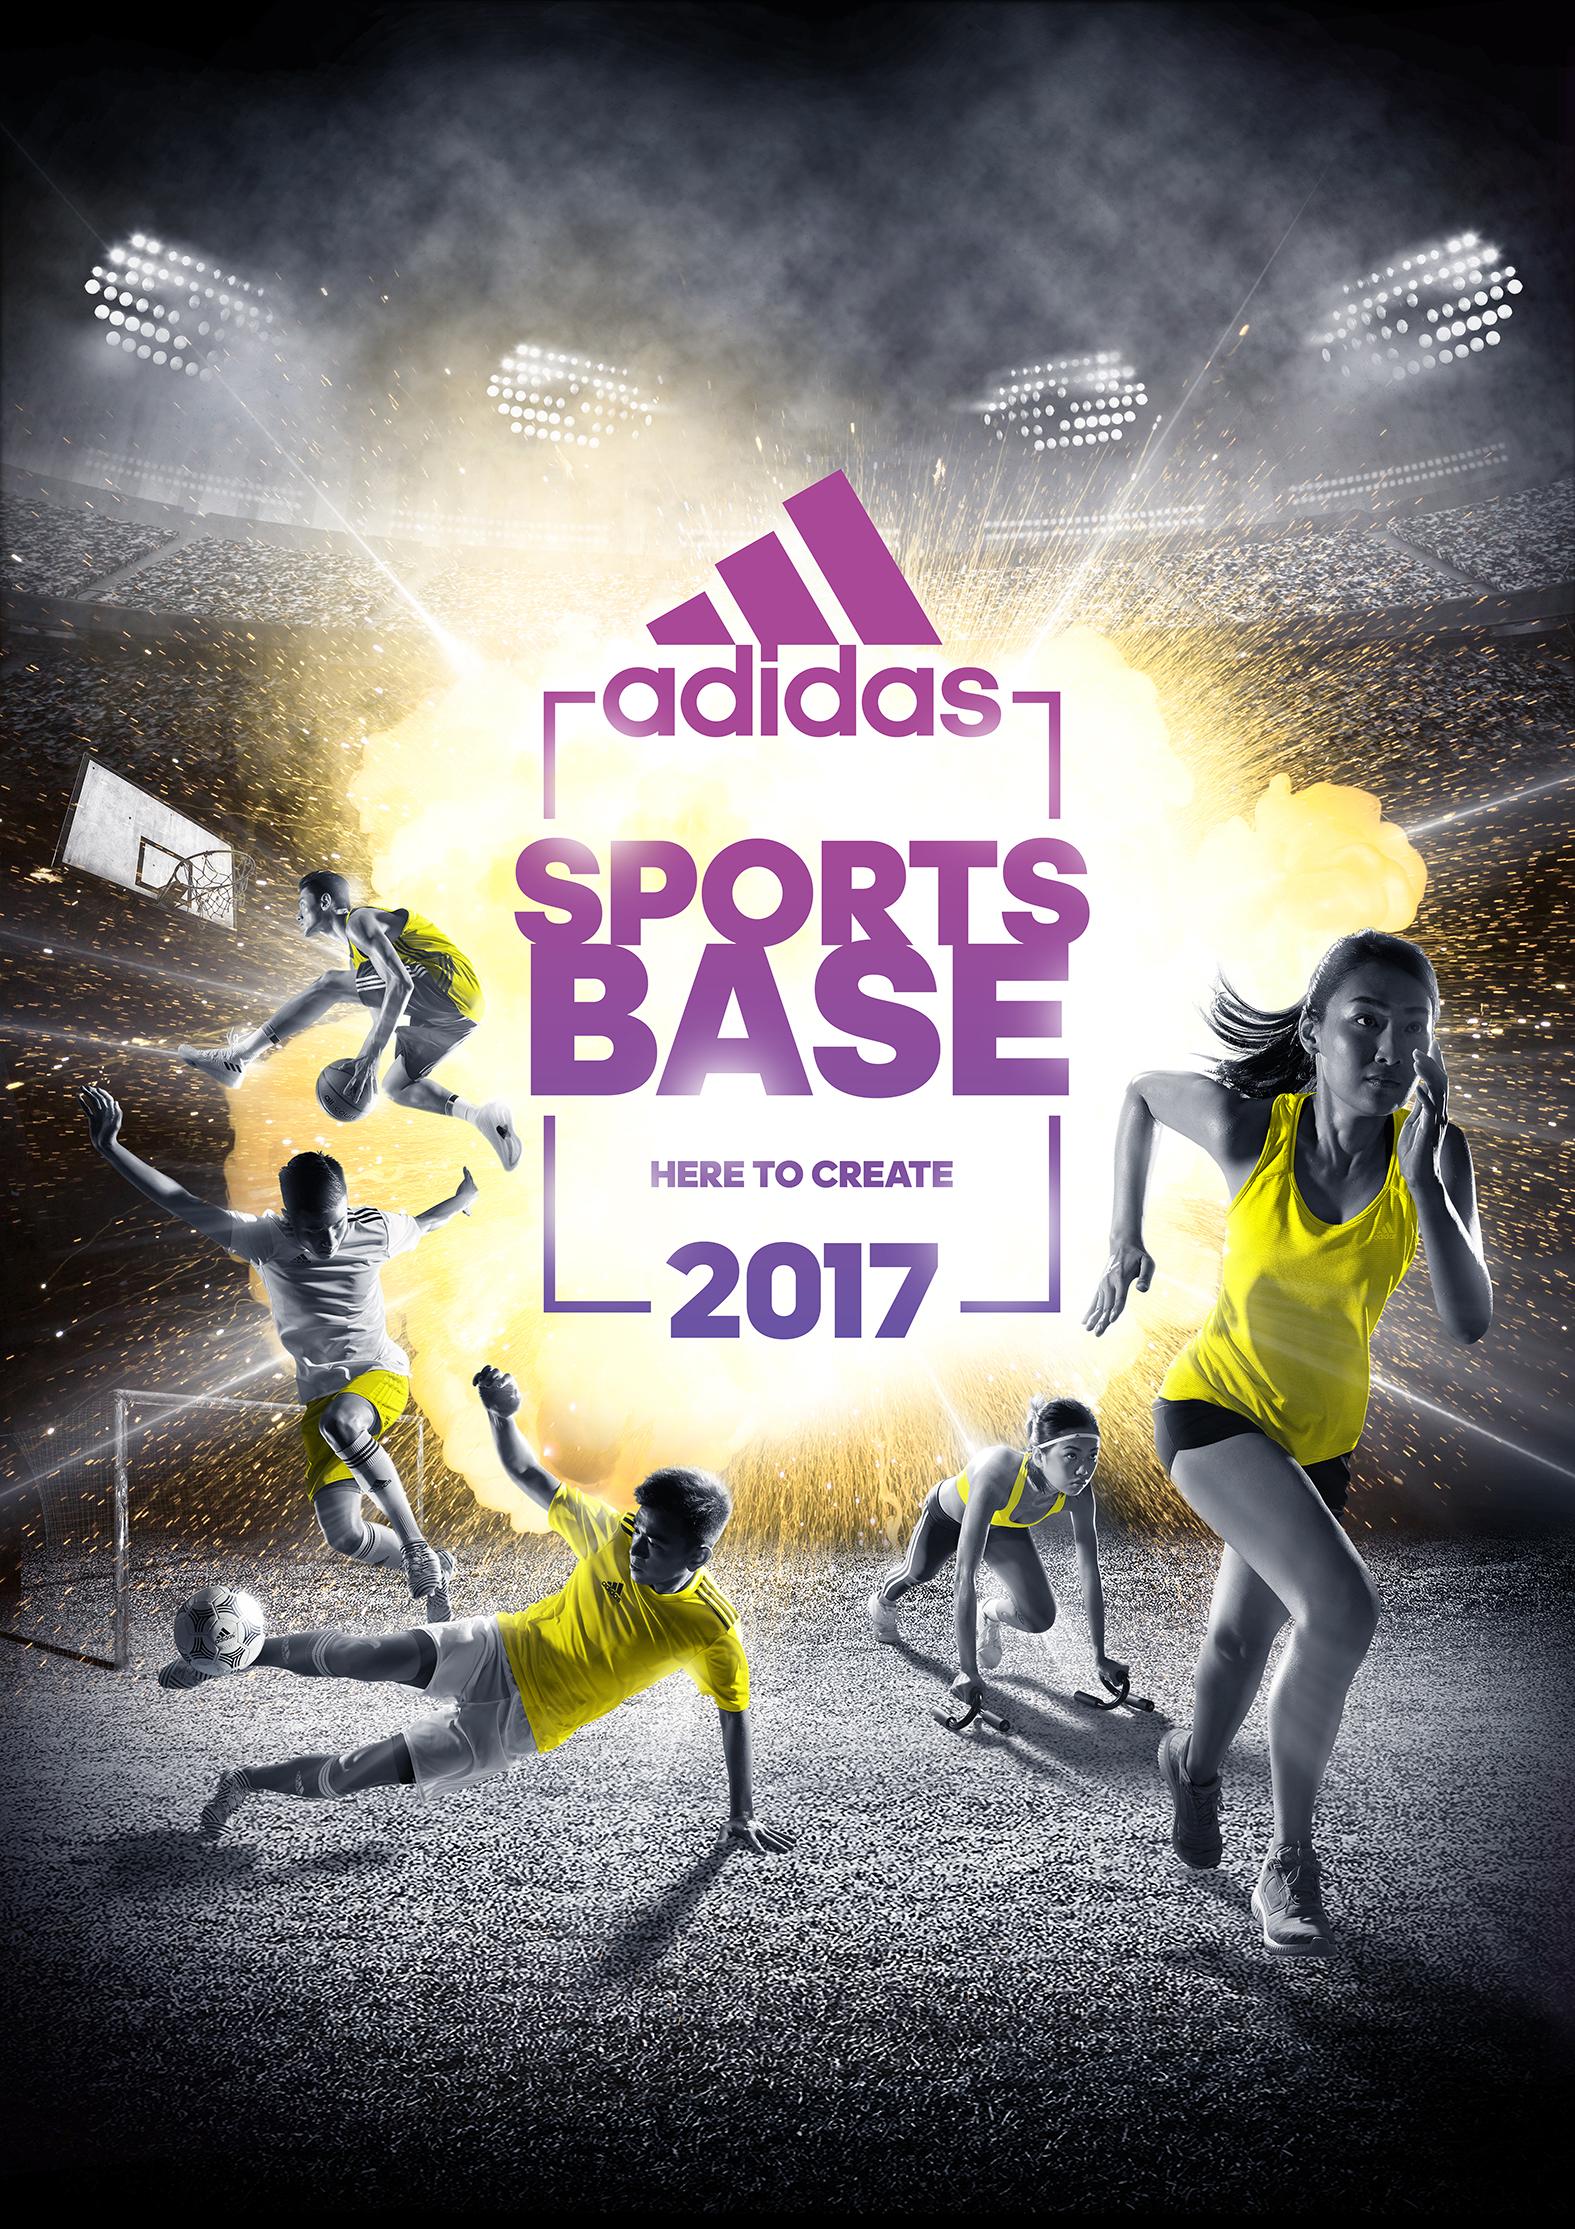 Adidas-Sportsbase-KeyVisual-Portrait-Final.jpg